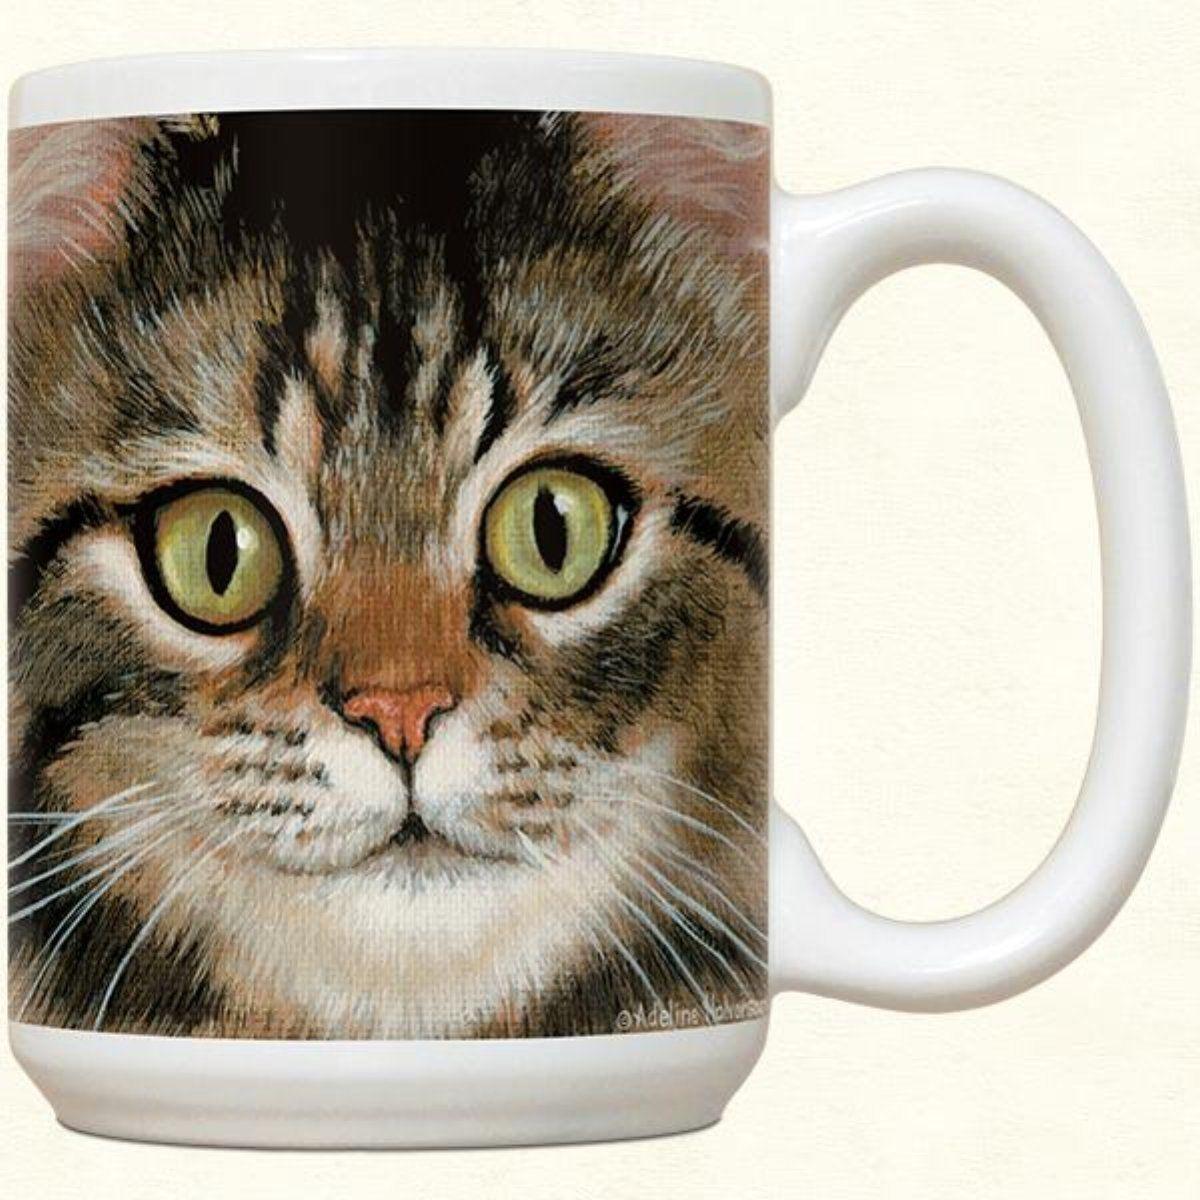 Brown Tabby Cat Ceramic Mug 15 oz Tabby cat, Grey tabby